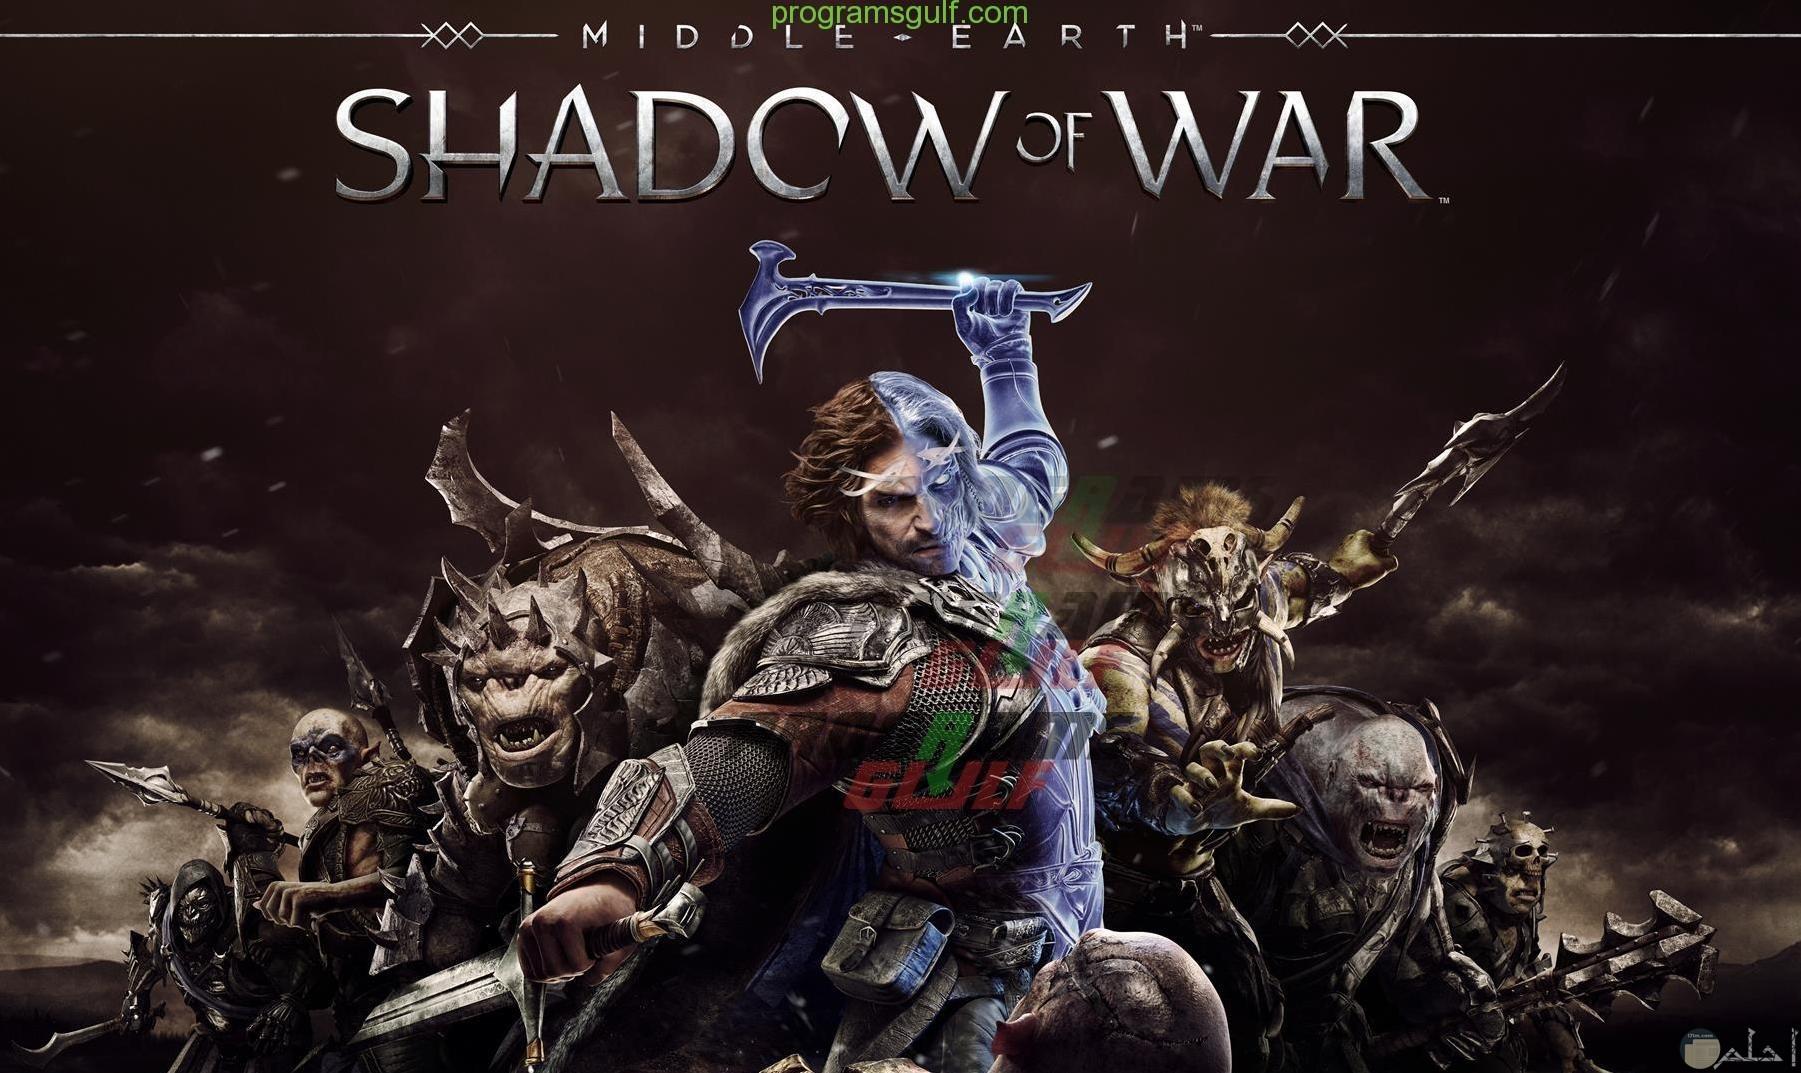 _Shadow_of_Warلعبة الحرب